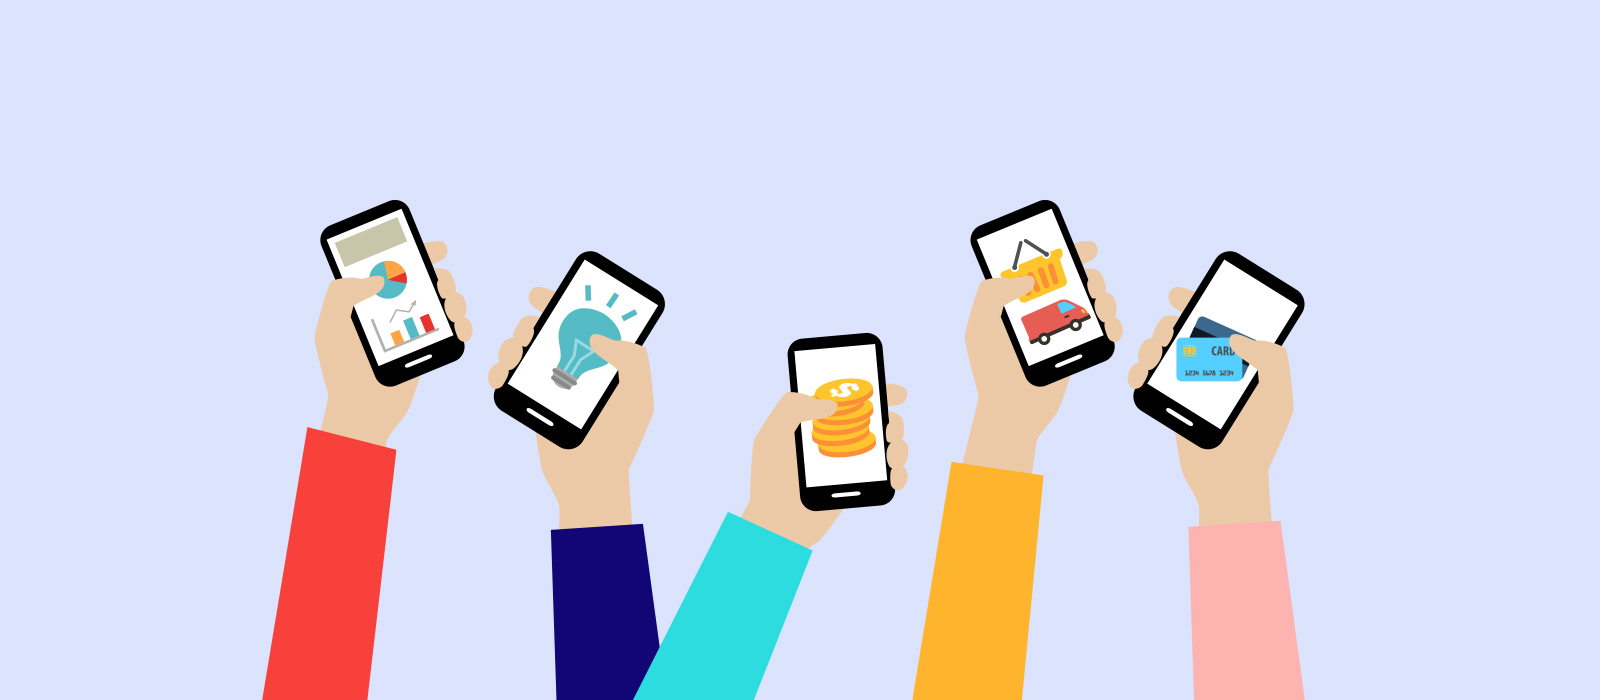 The way to assess an app